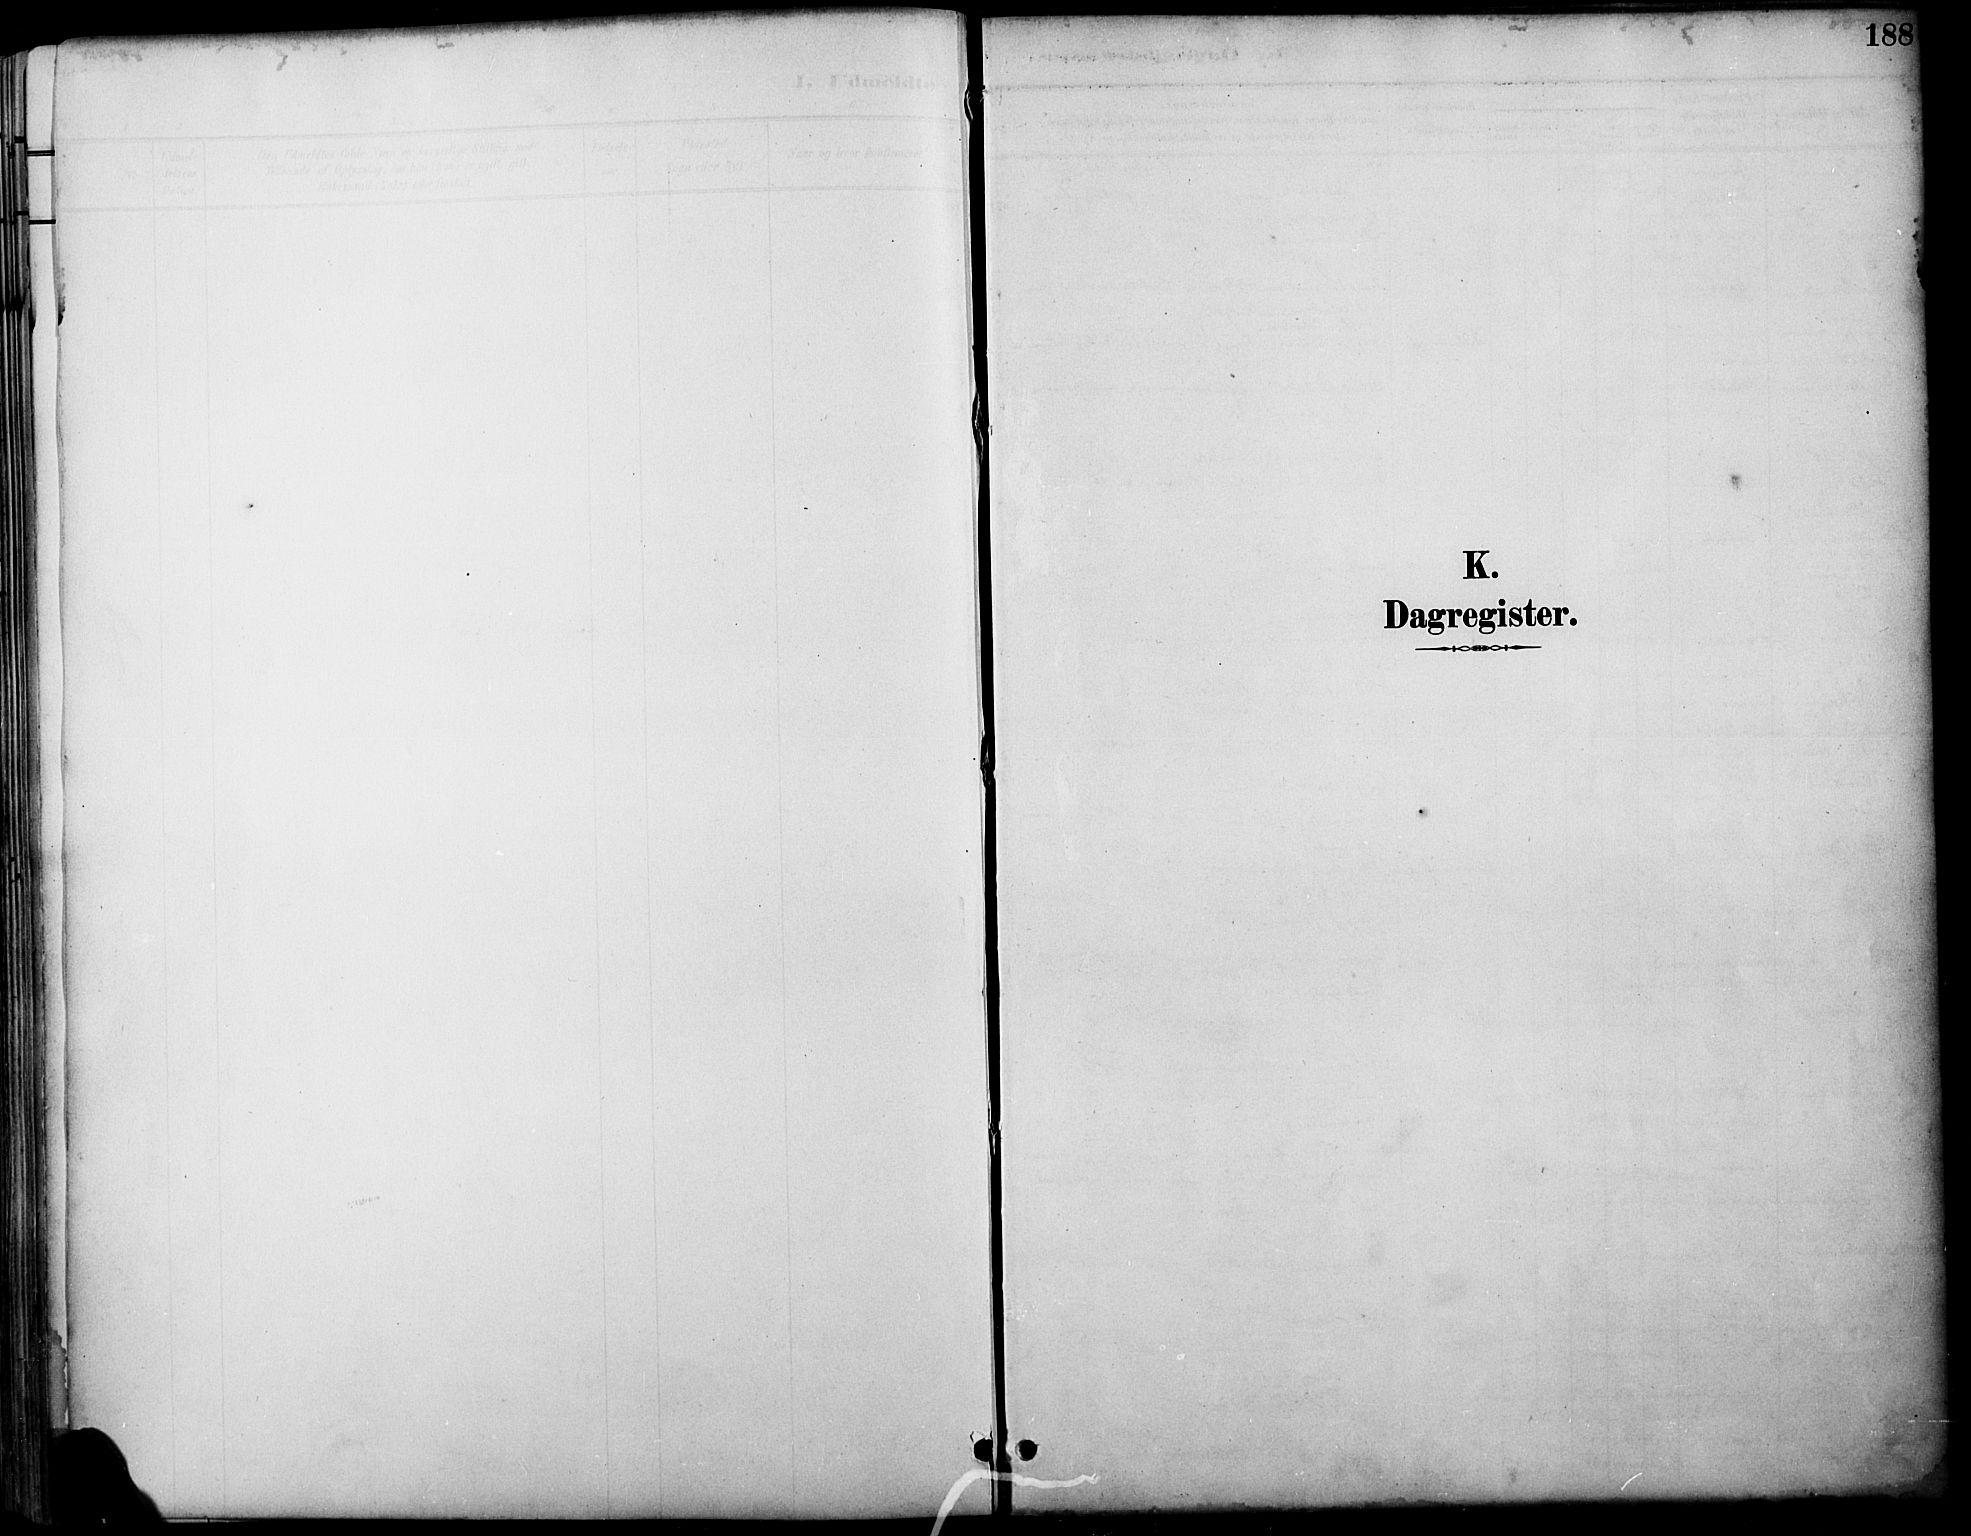 SAH, Østre Gausdal prestekontor, Ministerialbok nr. 2, 1887-1897, s. 188